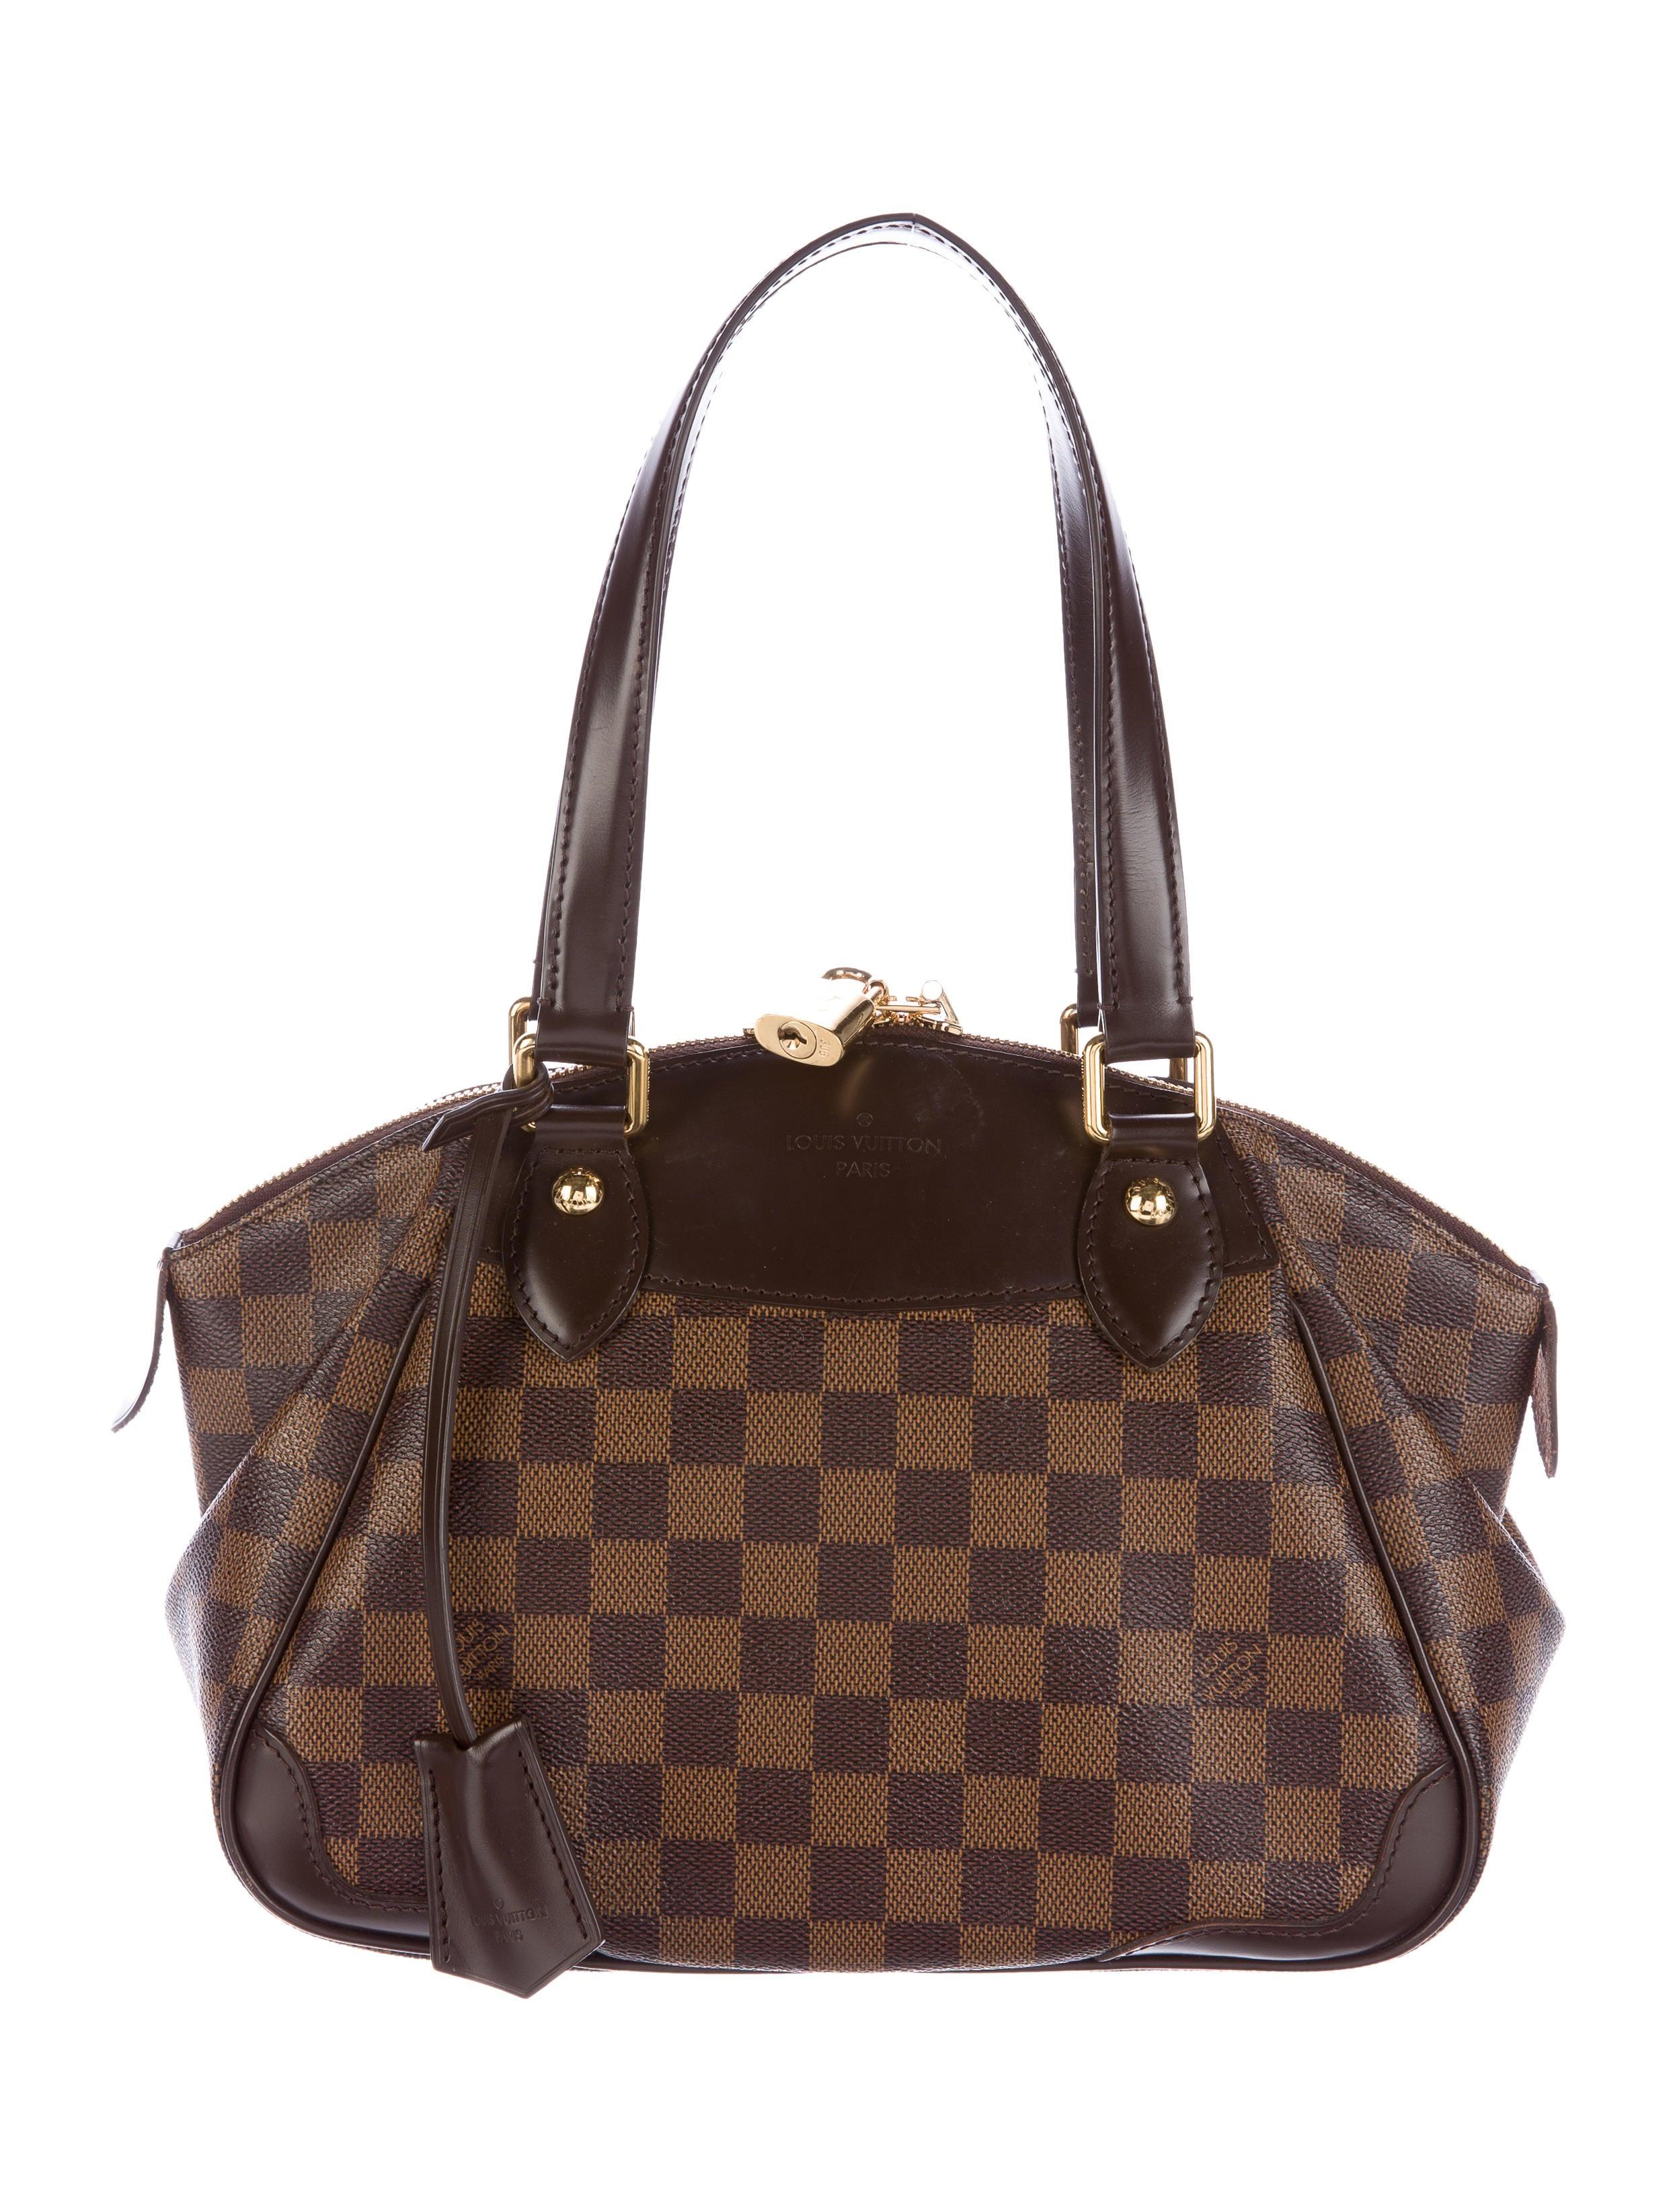 0a69457891f Louis Vuitton Damier Ebene Verona PM - Handbags - LOU110585